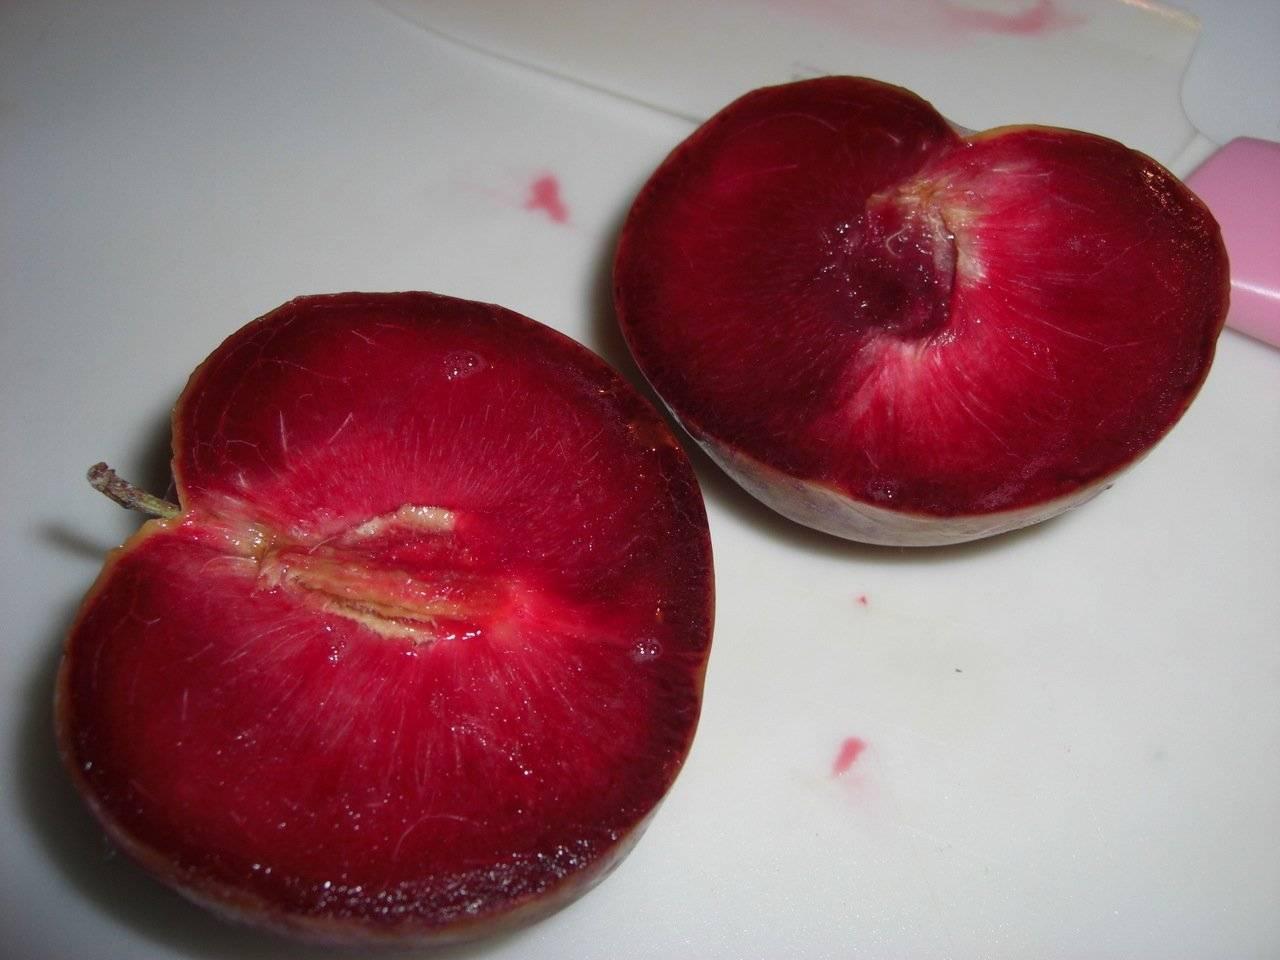 Характеристика и описание абрикоса чёрный бархат